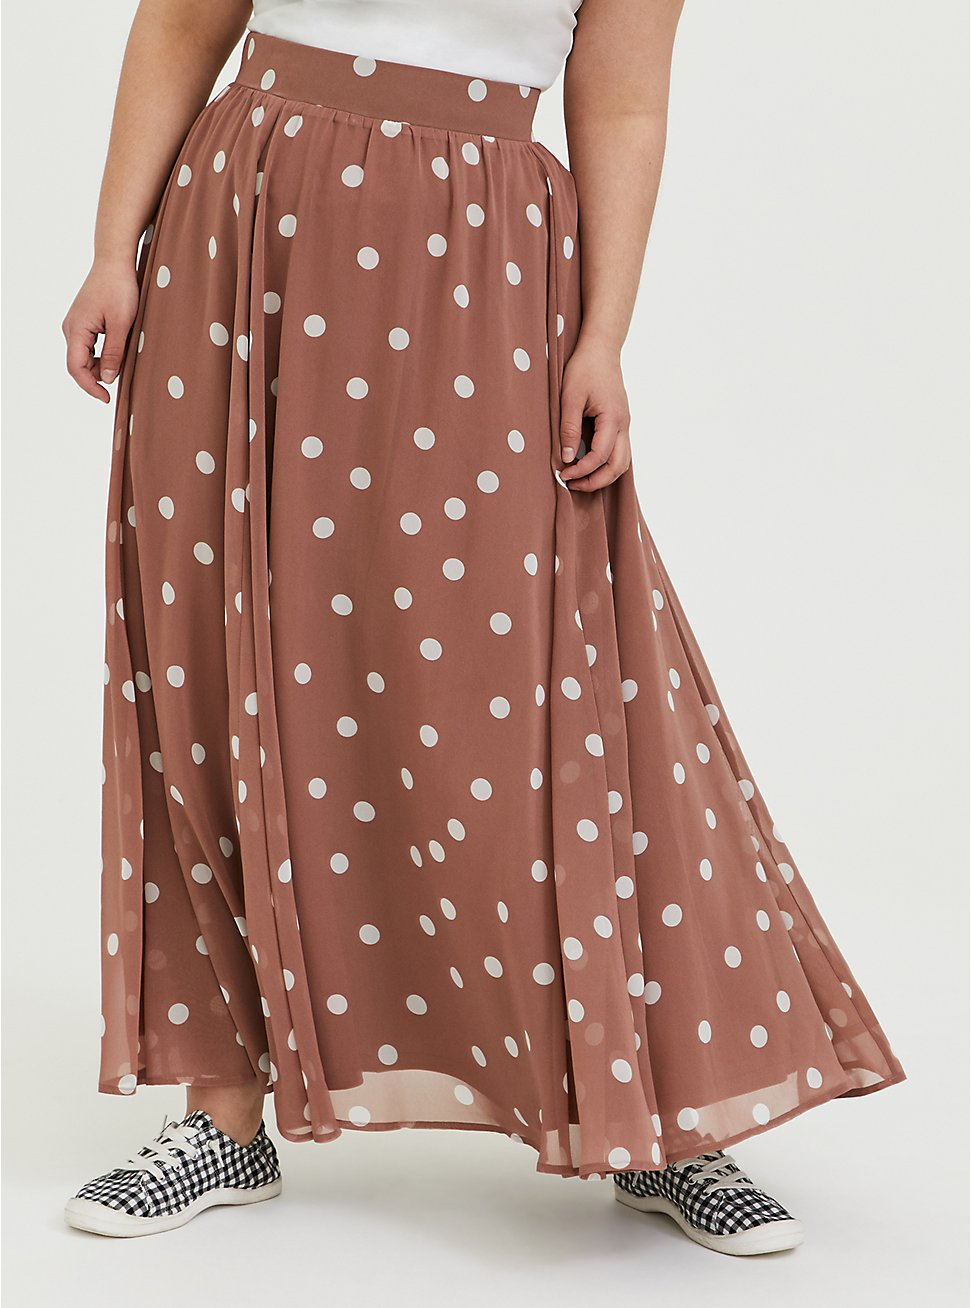 Walnut Polka Dot Chiffon Maxi Skirt, DOTS - BROWN, hi-res